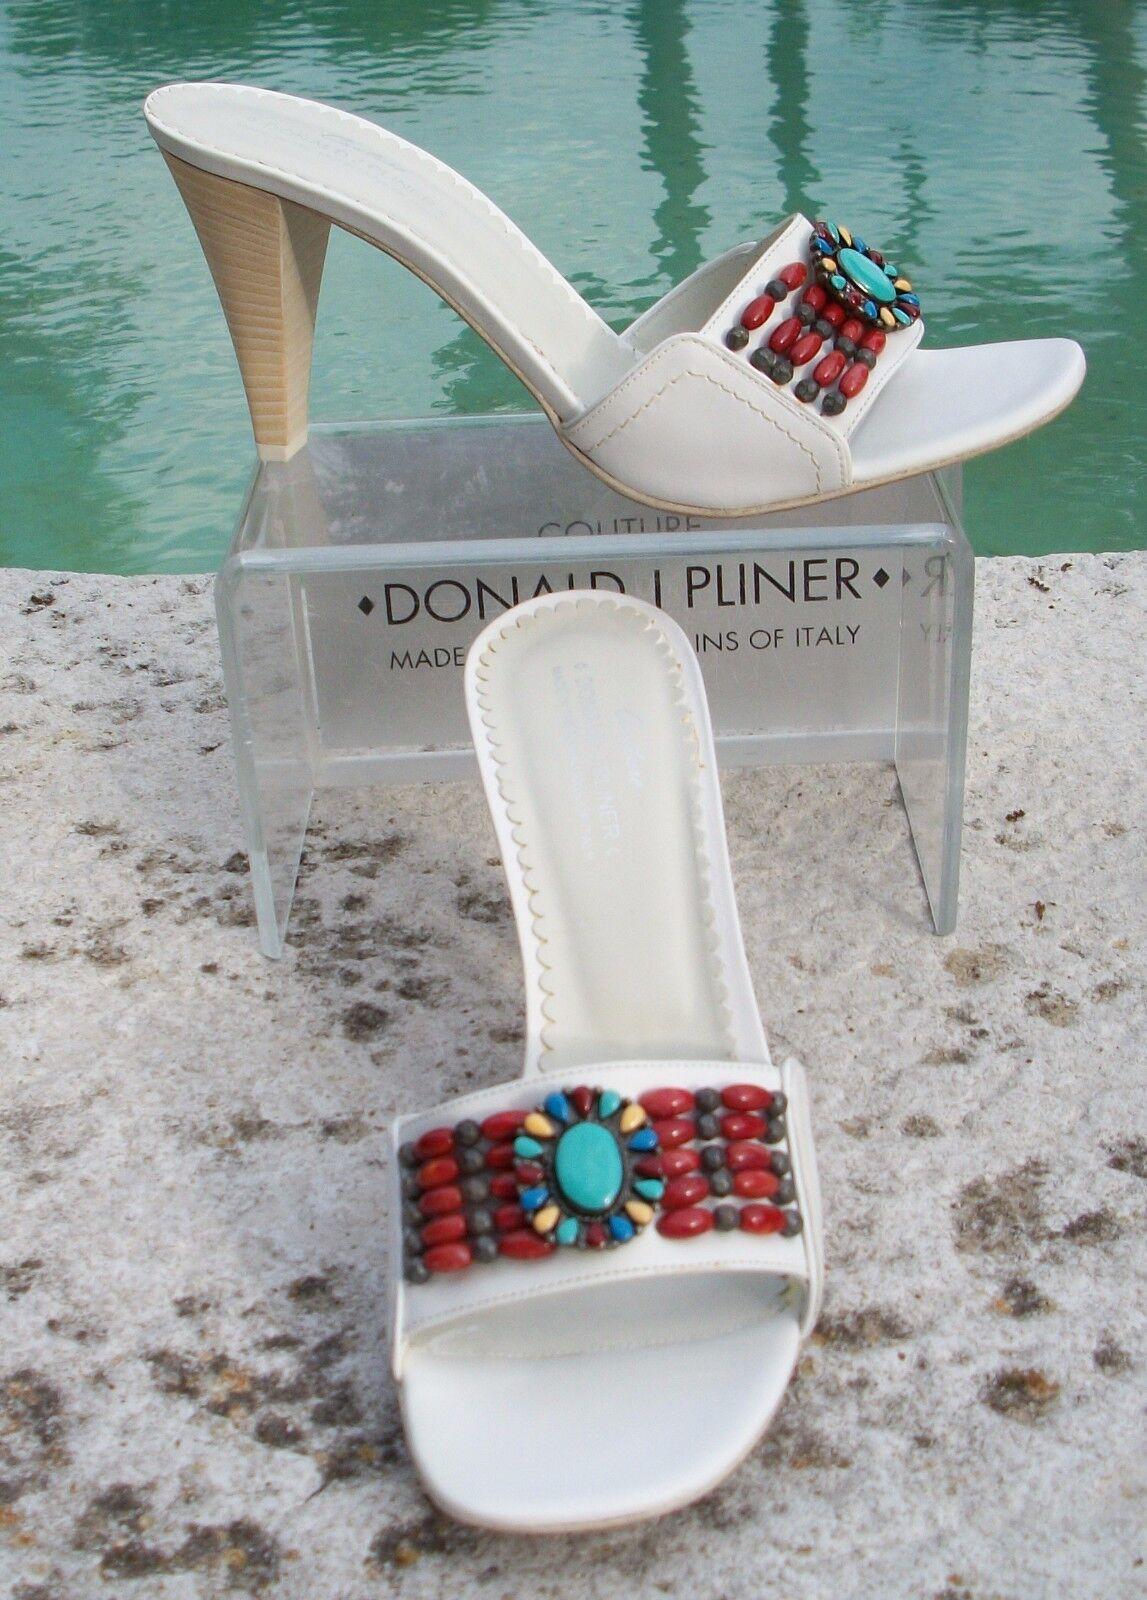 Donald Pliner Couture Metallic Leather chaussures New 10 Chunky Chunky Chunky Stones Velvet NIB  250 badb00